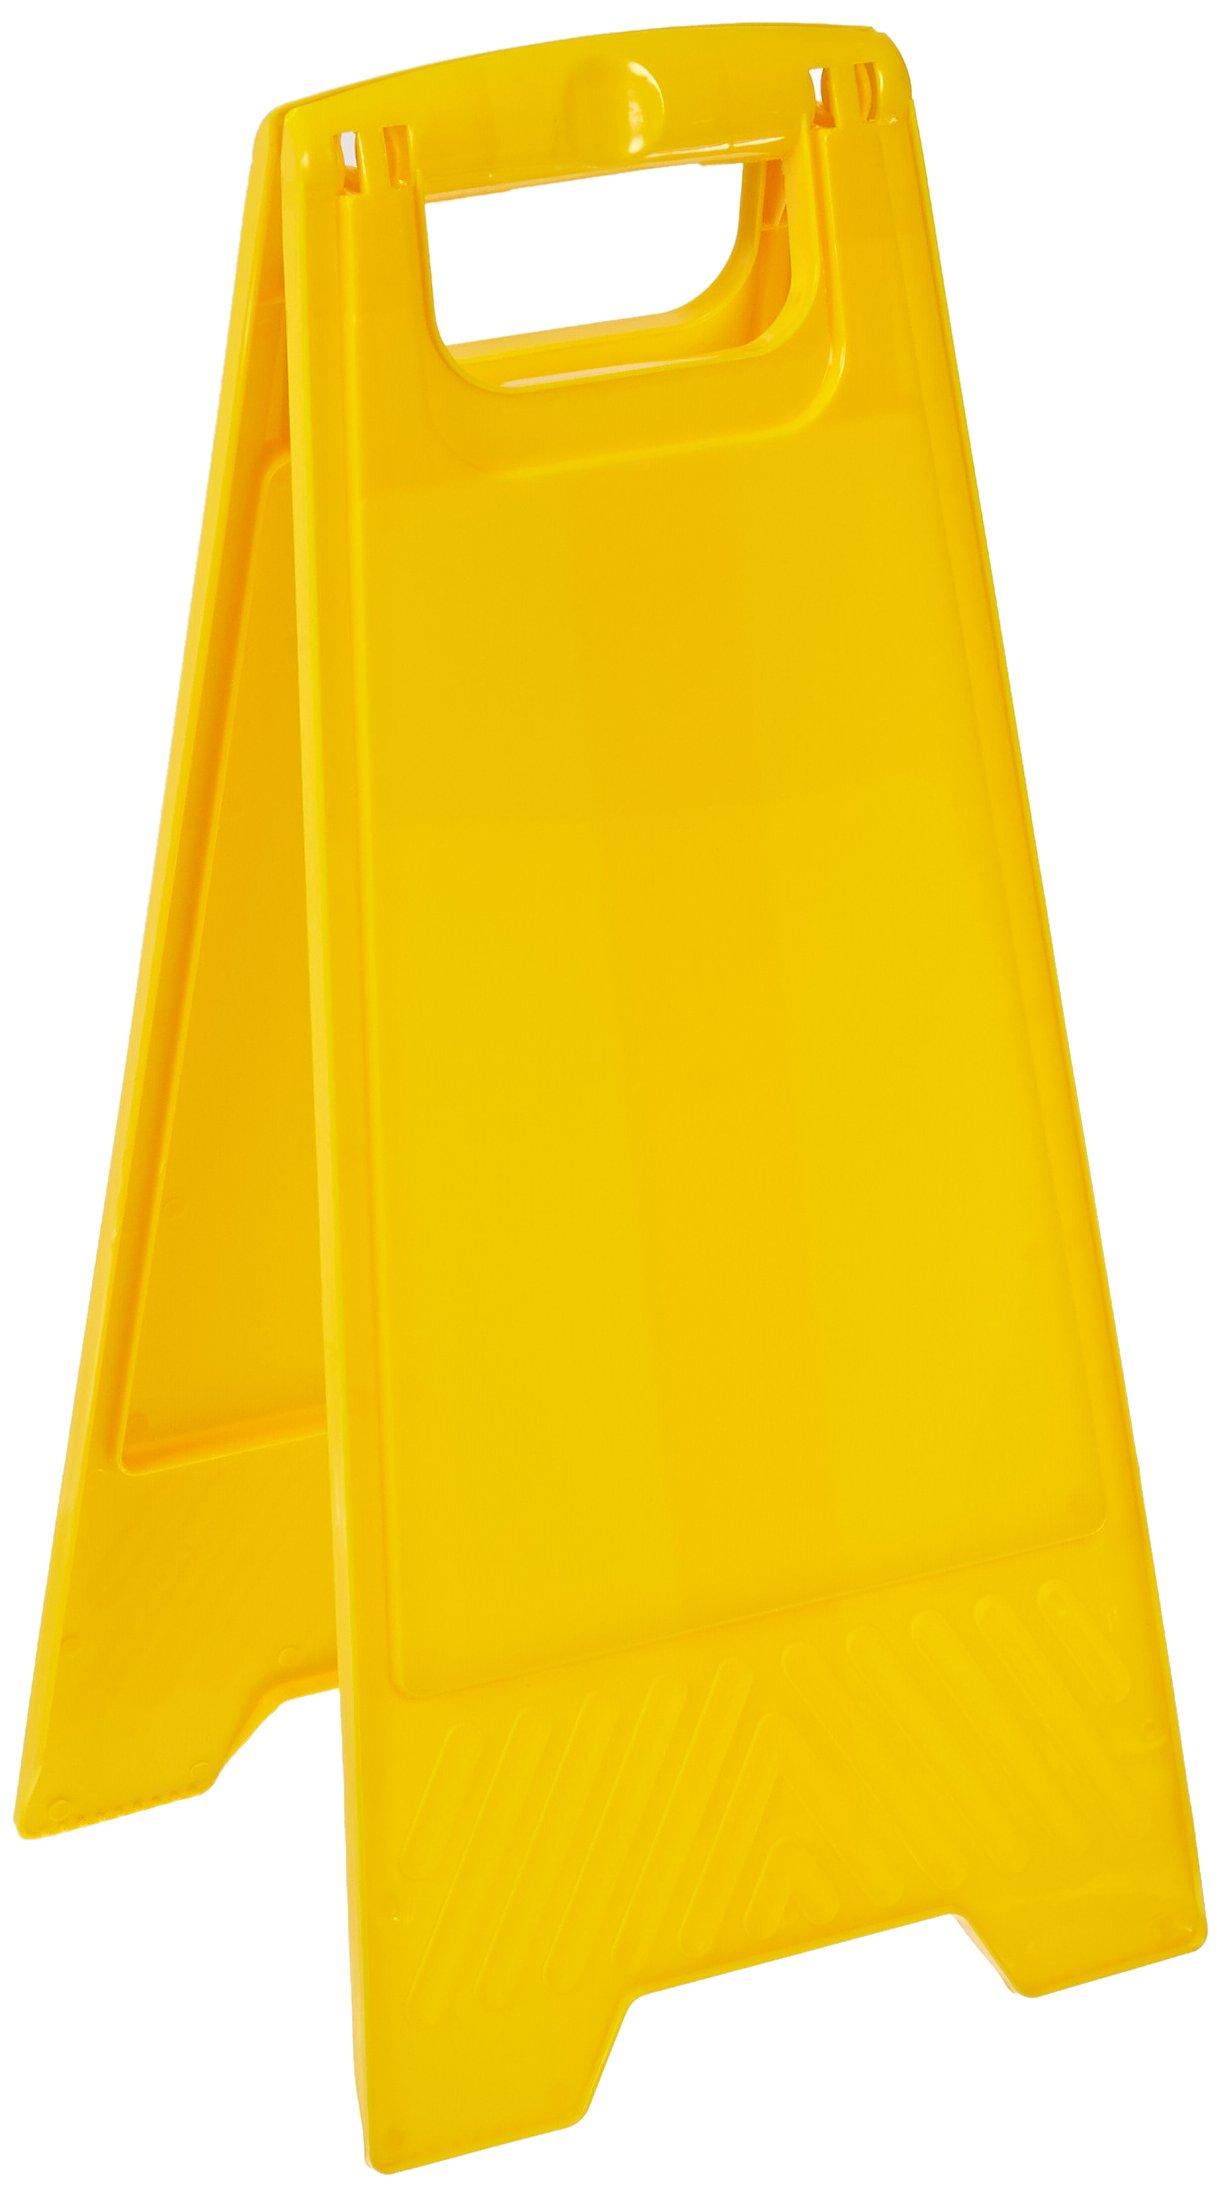 Brady 104808 24-1/2'' Height, Yellow Color Polypropylene Heavy Duty Floor Stand, Legend''Blank Yellow''